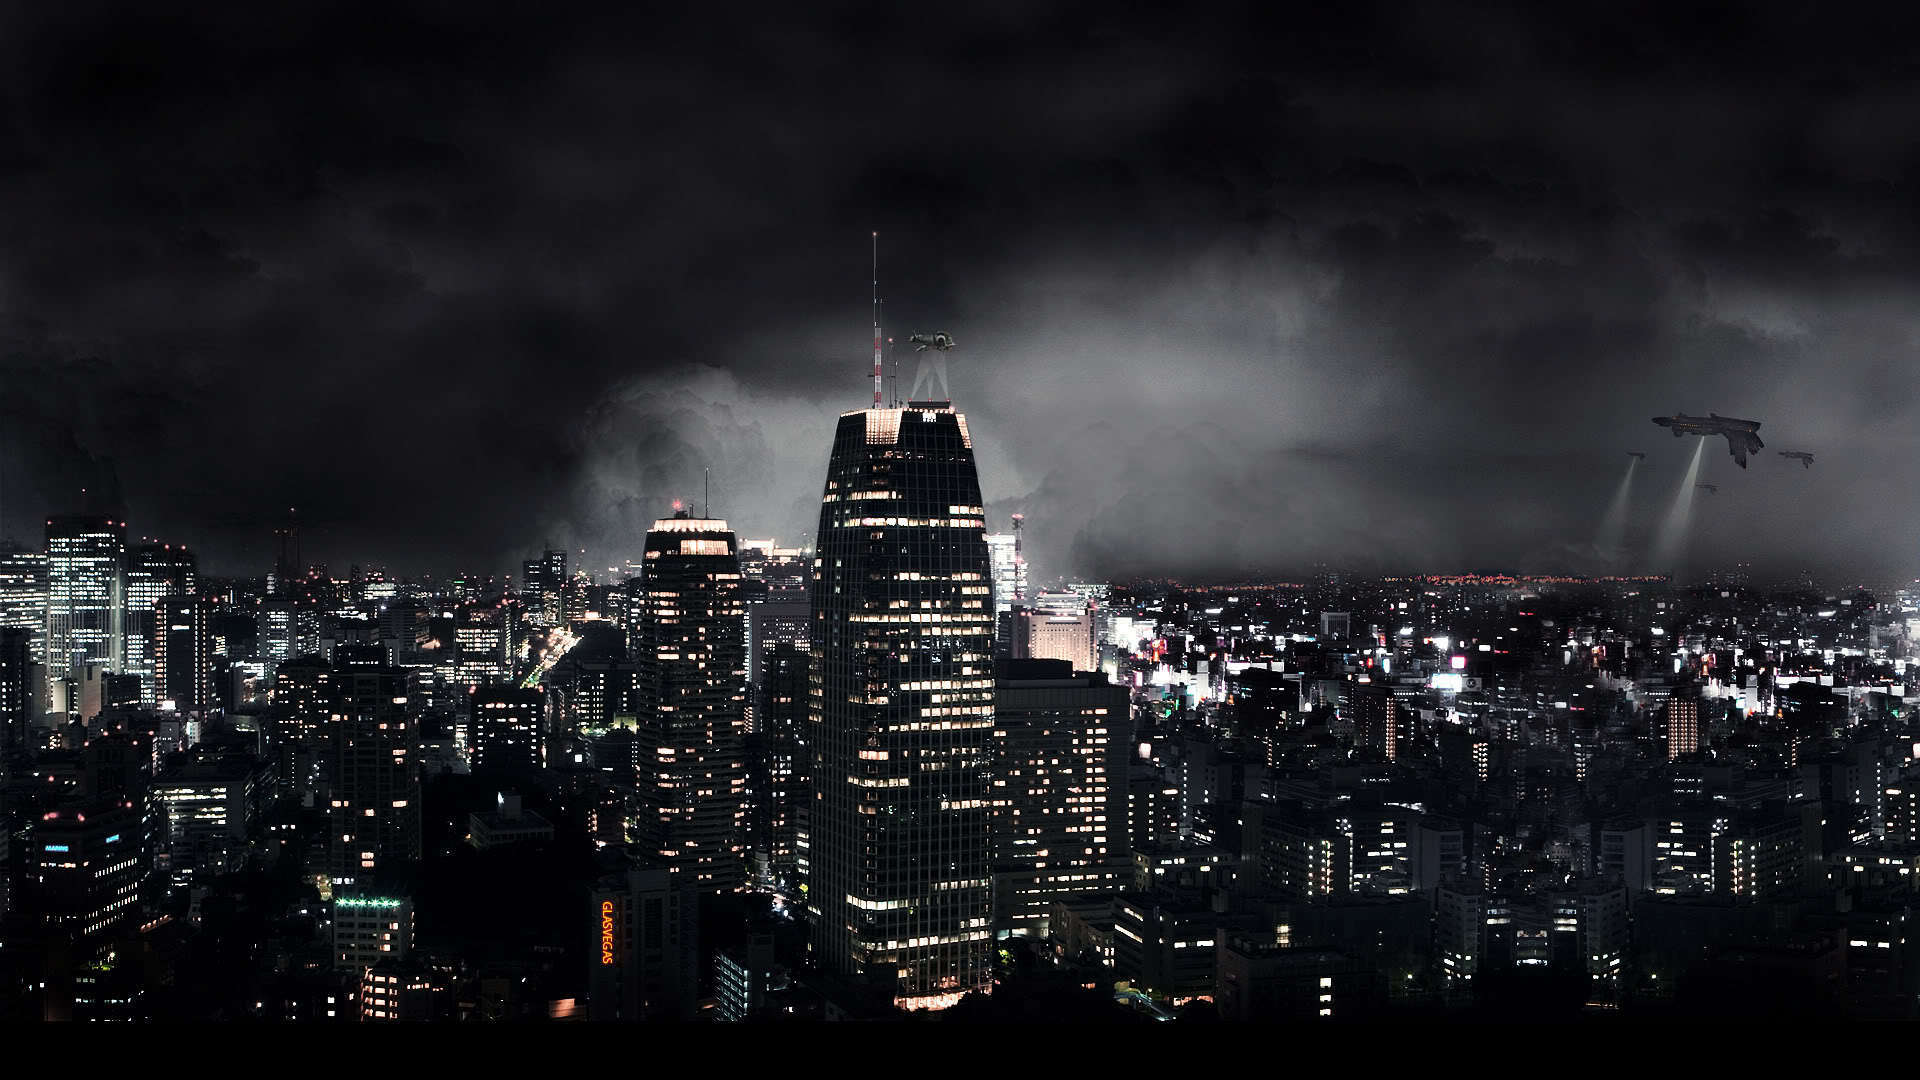 The Big City In Sci Fi   HD Wallpaper Wallpaper 21718727 1920x1080